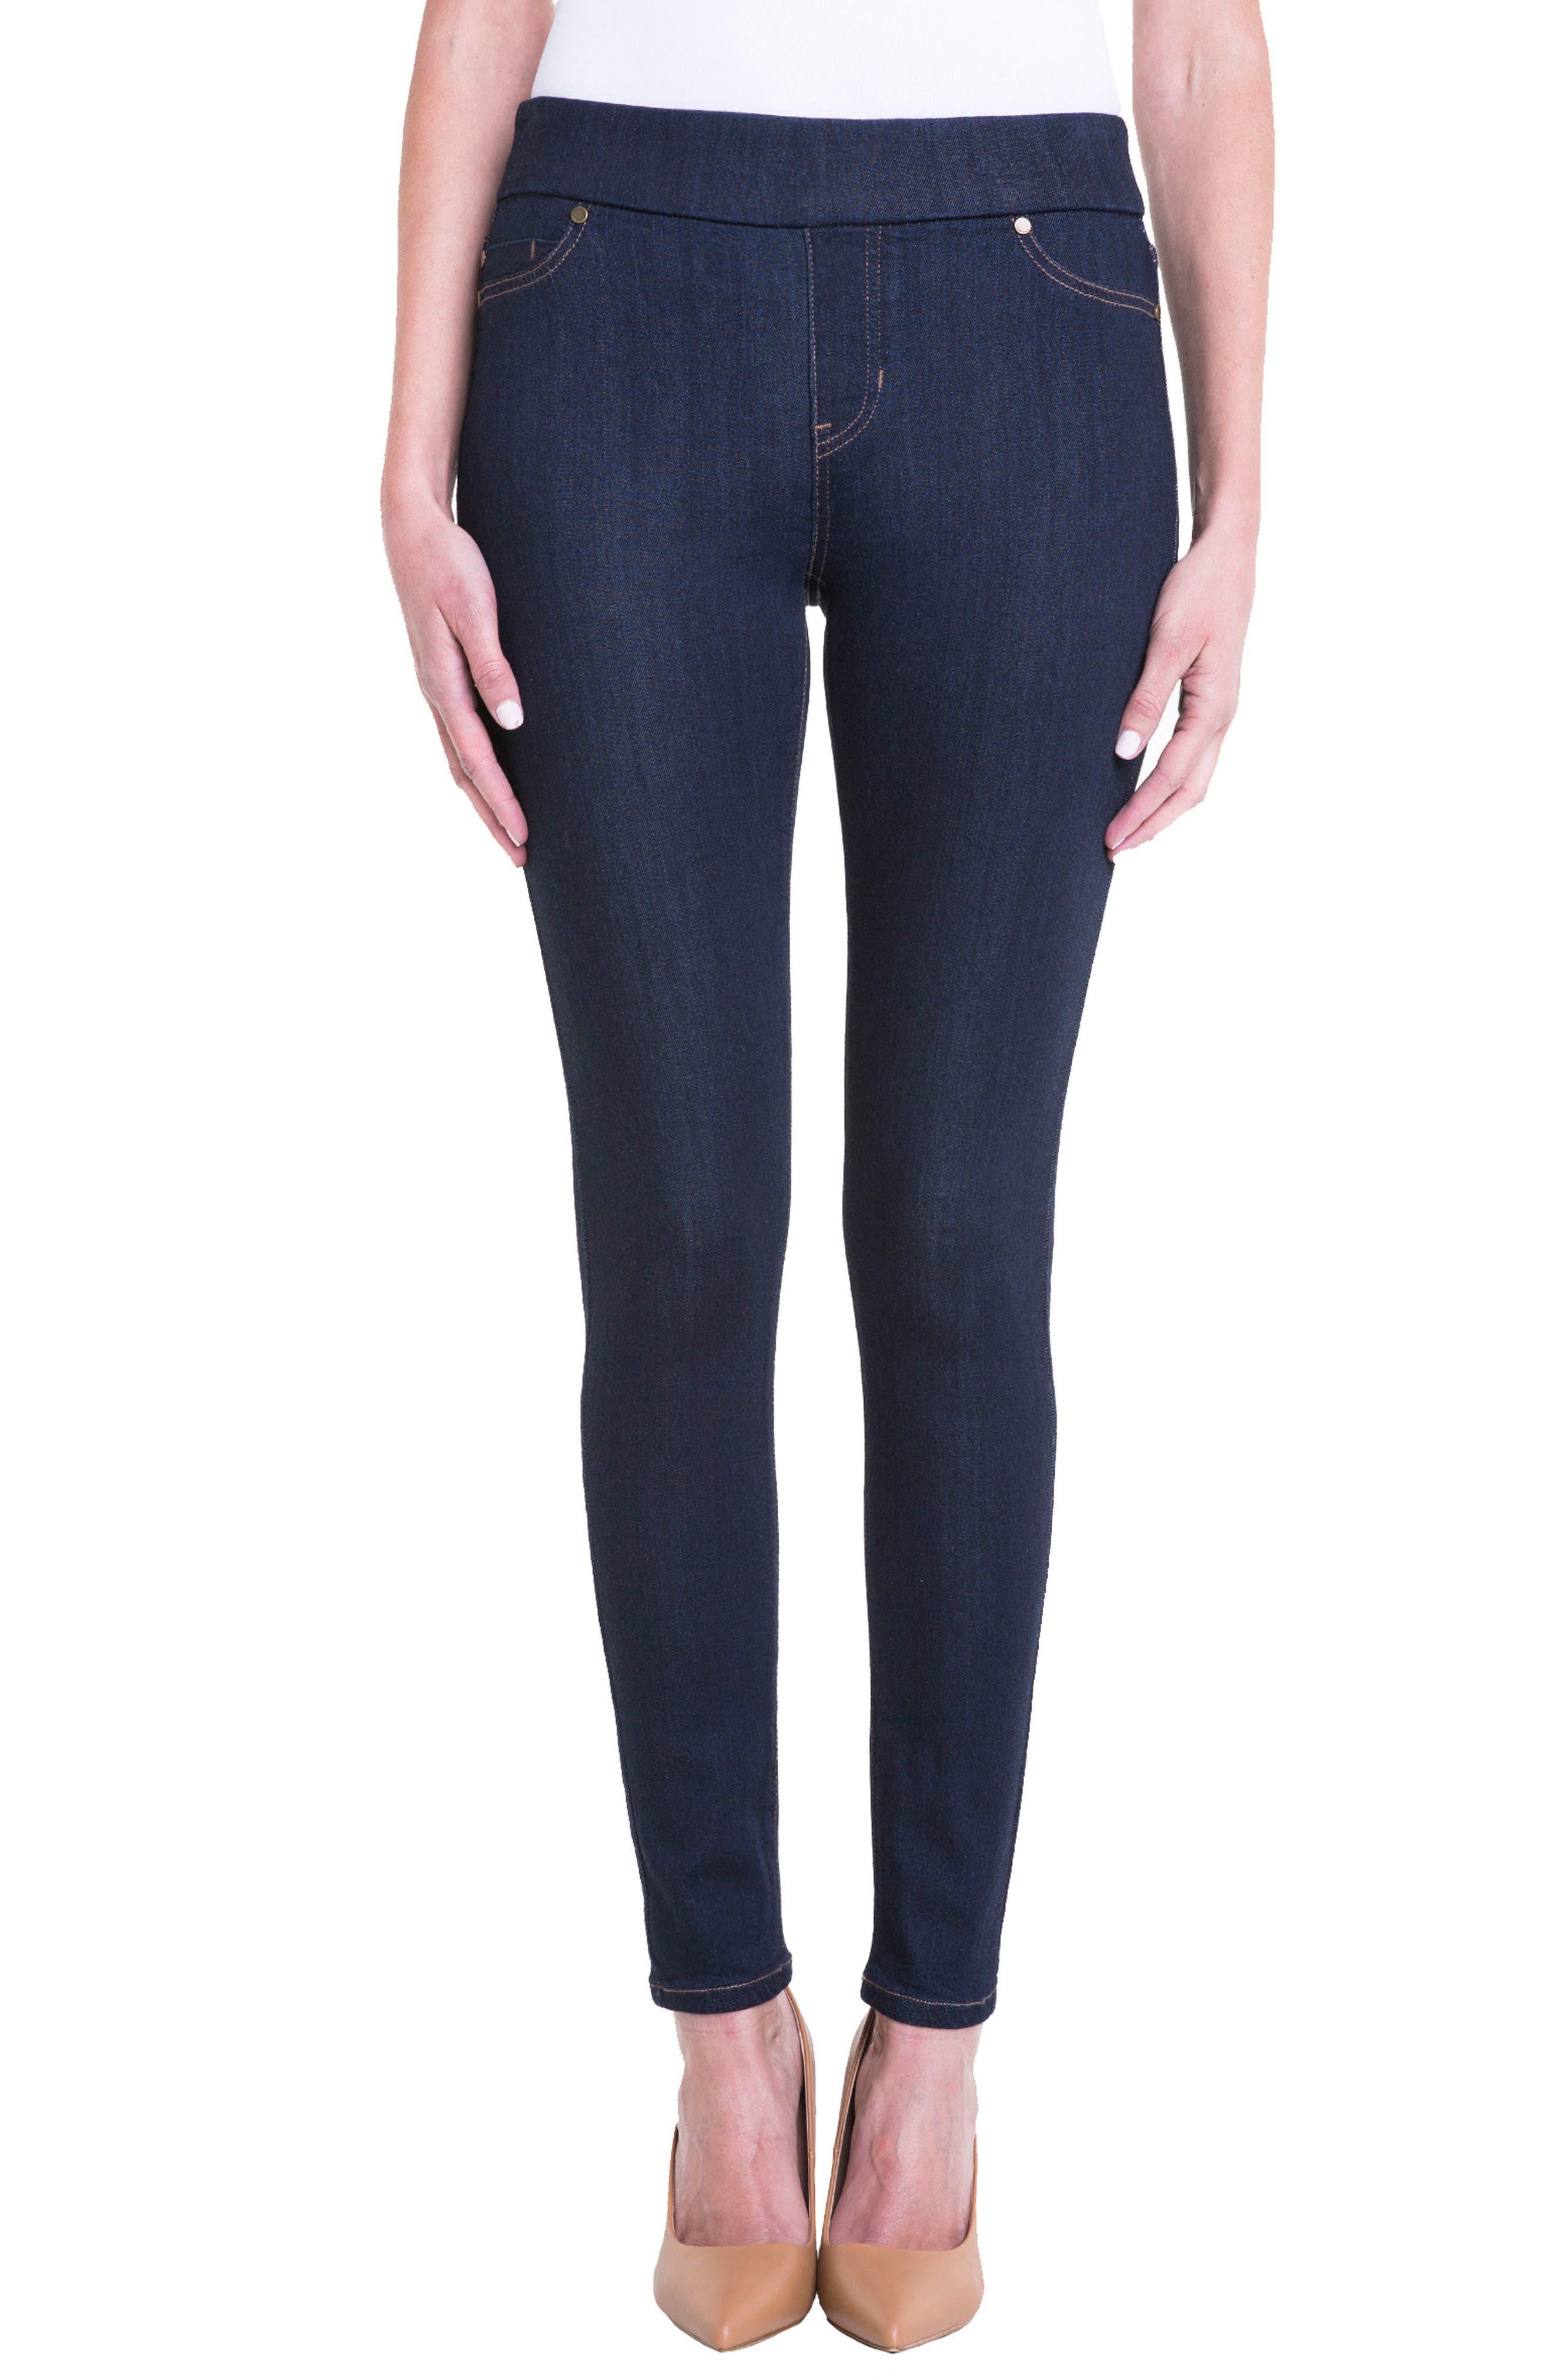 Jeans Company Sienna Mid Rise Soft Stretch Denim Leggings,                             Main thumbnail 1, color,                             Indigo Rinse